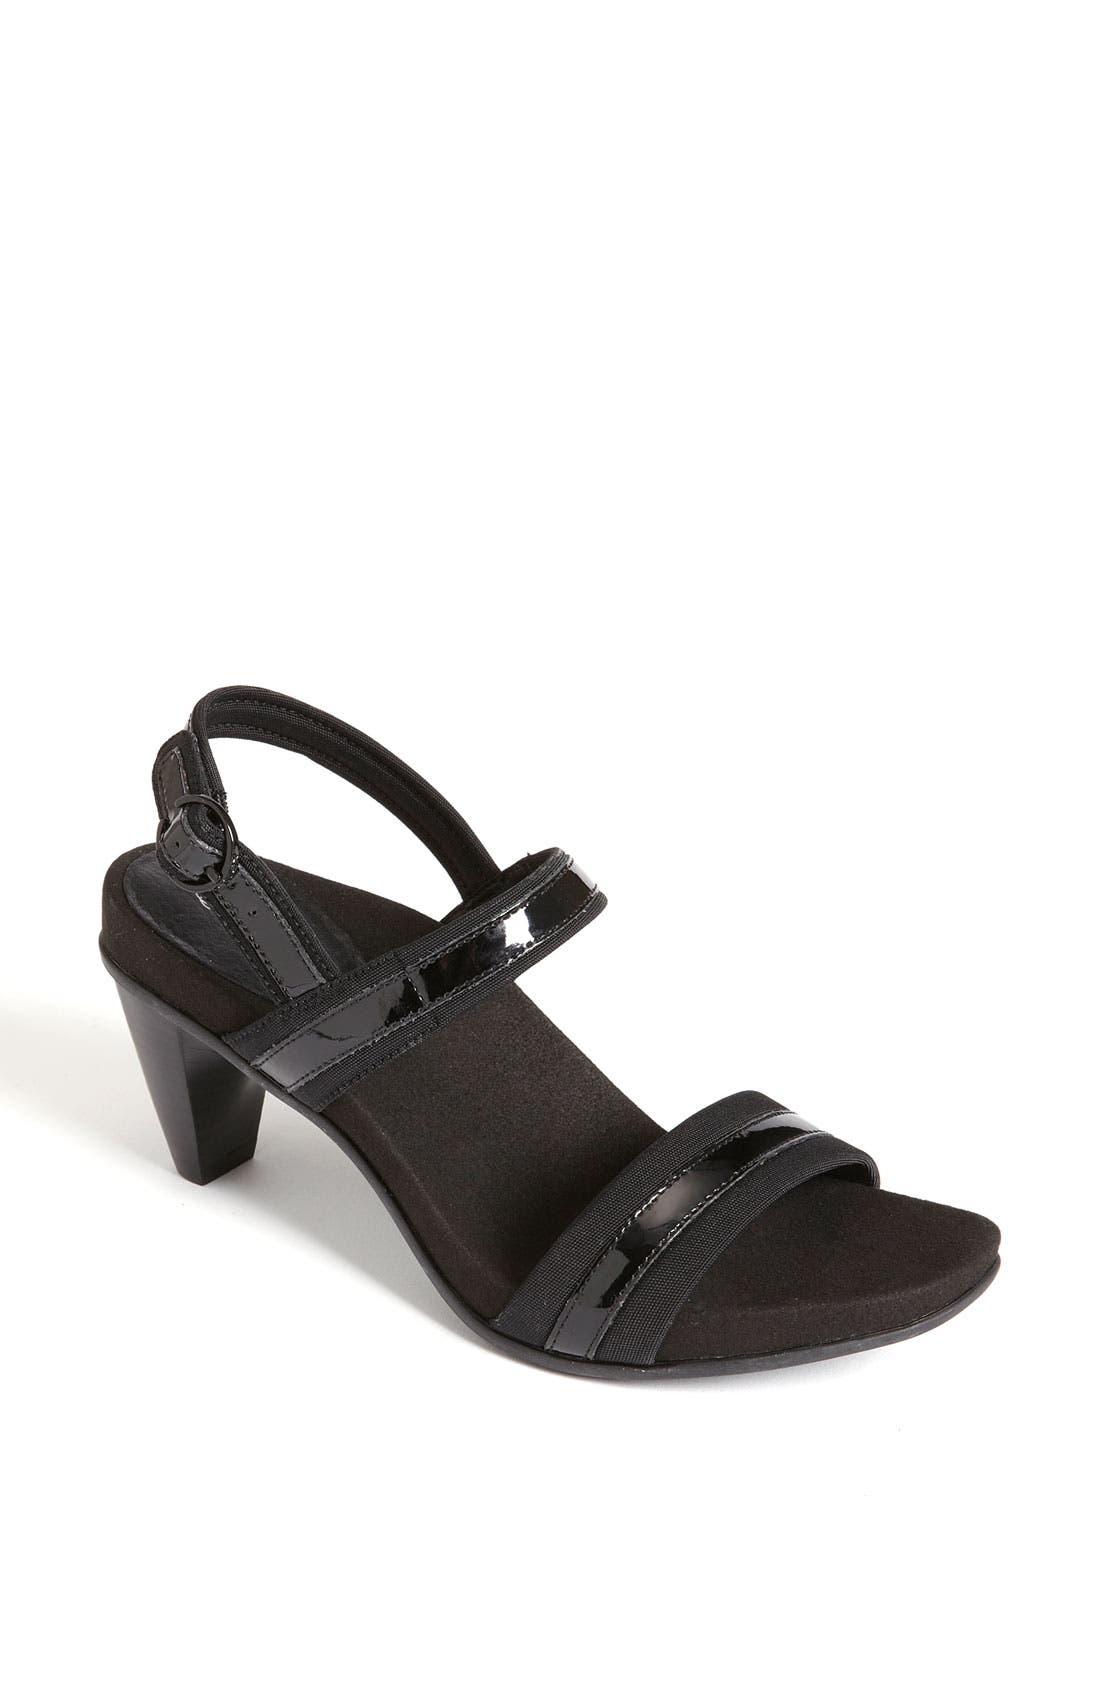 Main Image - Aetrex 'Kate' Sandal